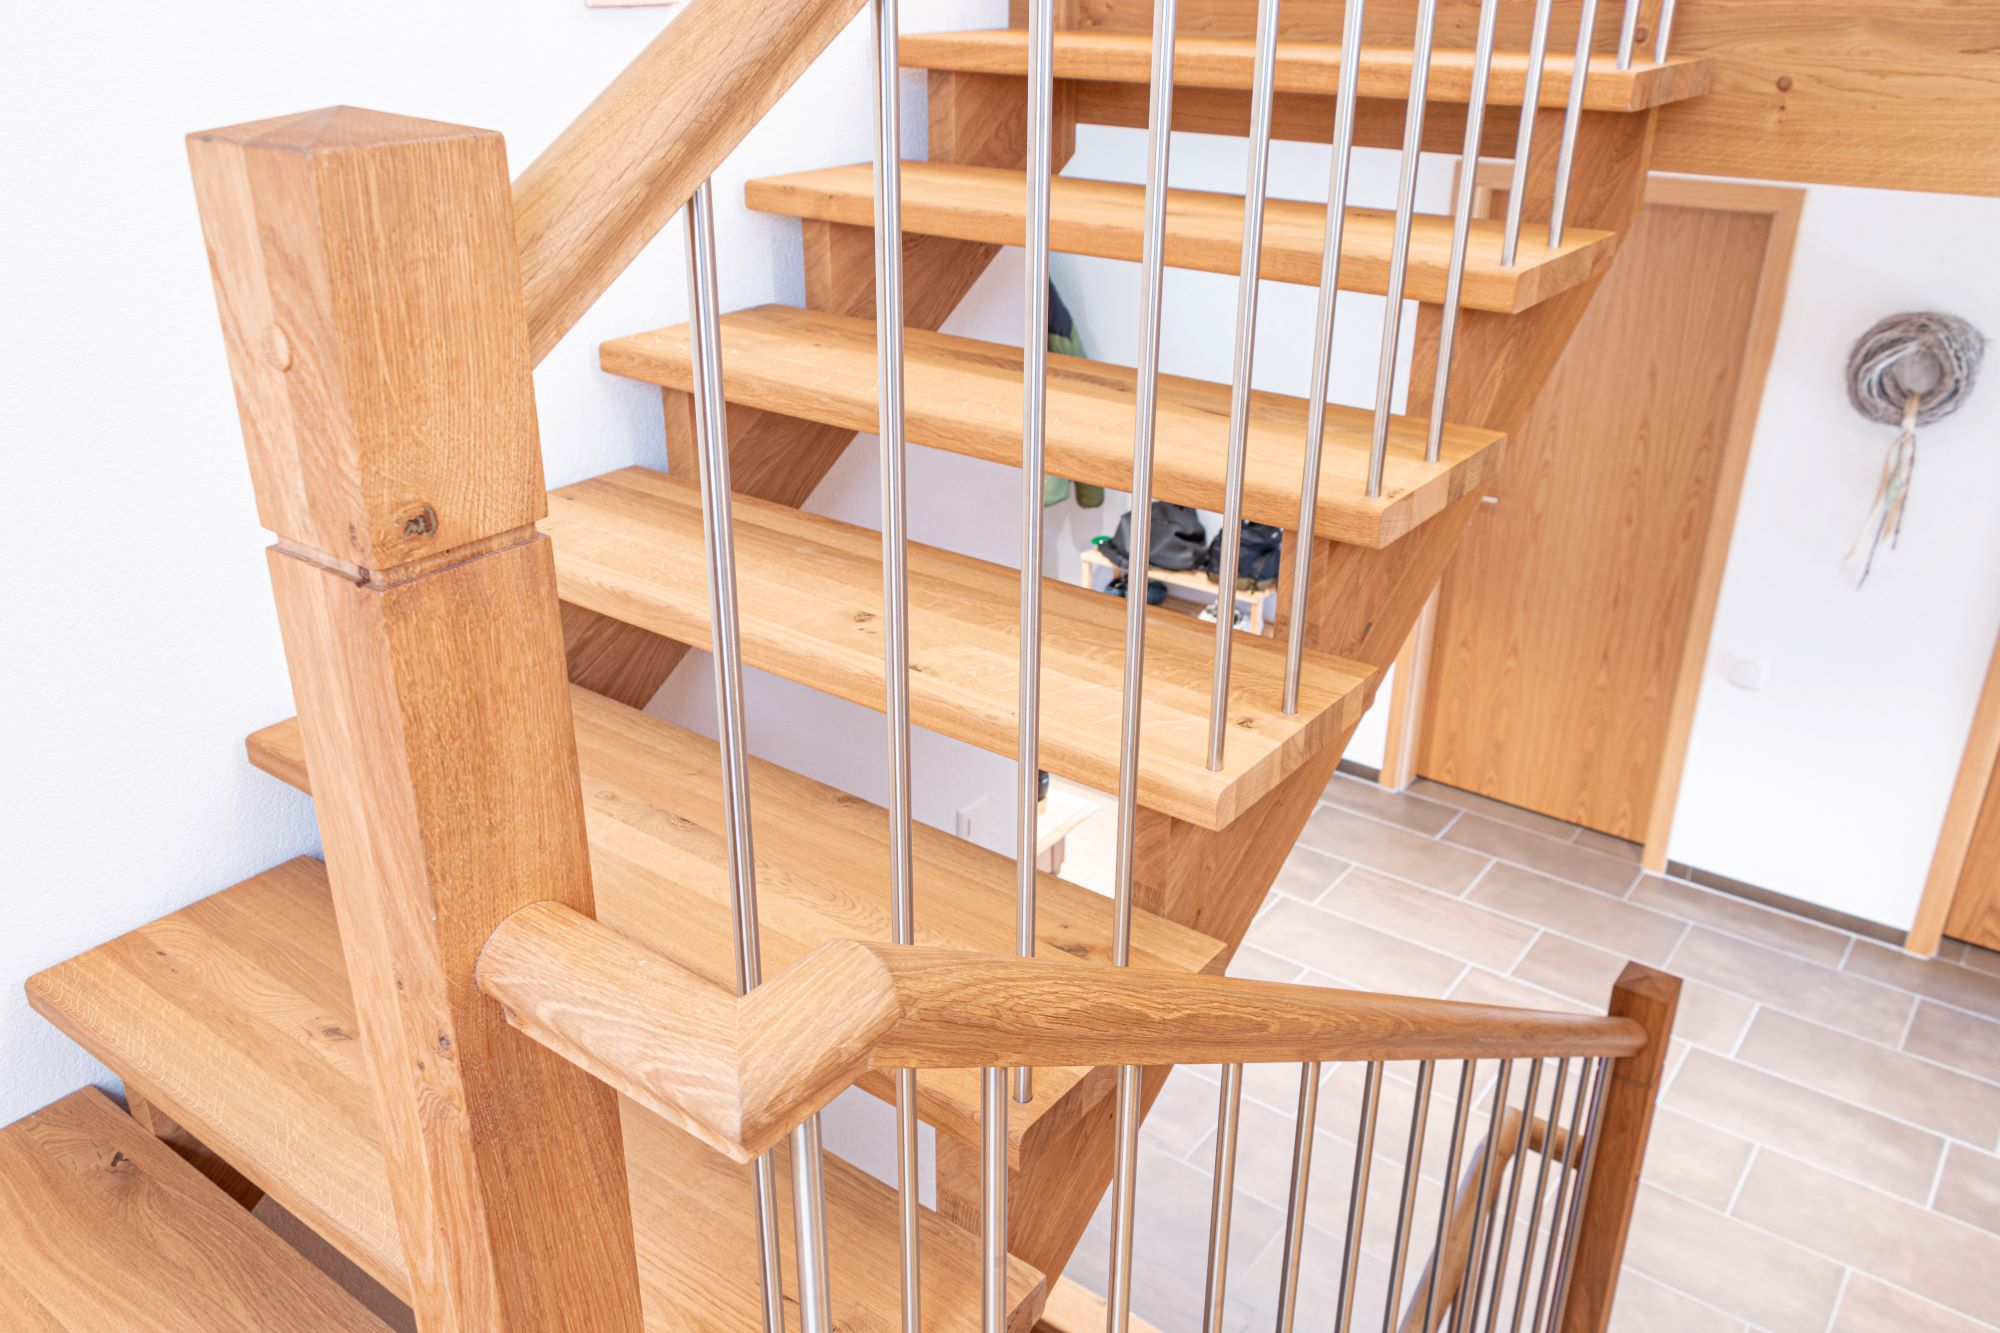 Stair Image 1296